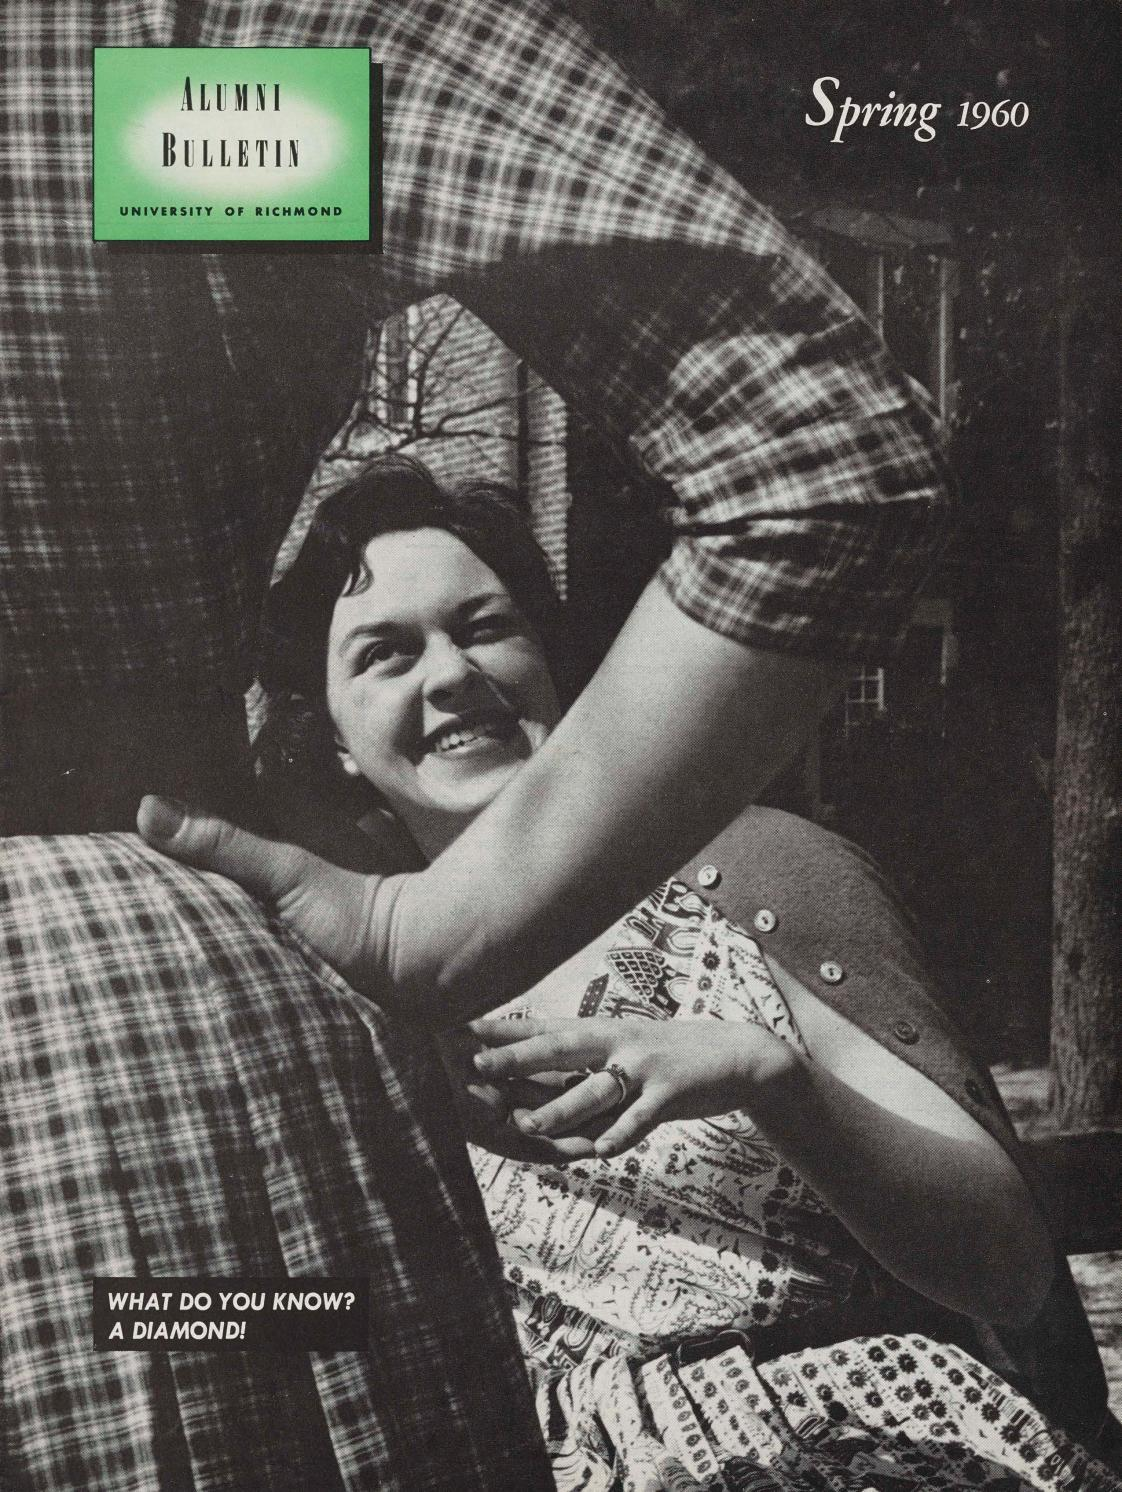 BOB CHRISTIE 100 MILE AN HOUR CLUB  AUTOGRAPHED 1960 INDY 500 8 X 10 PHOTO